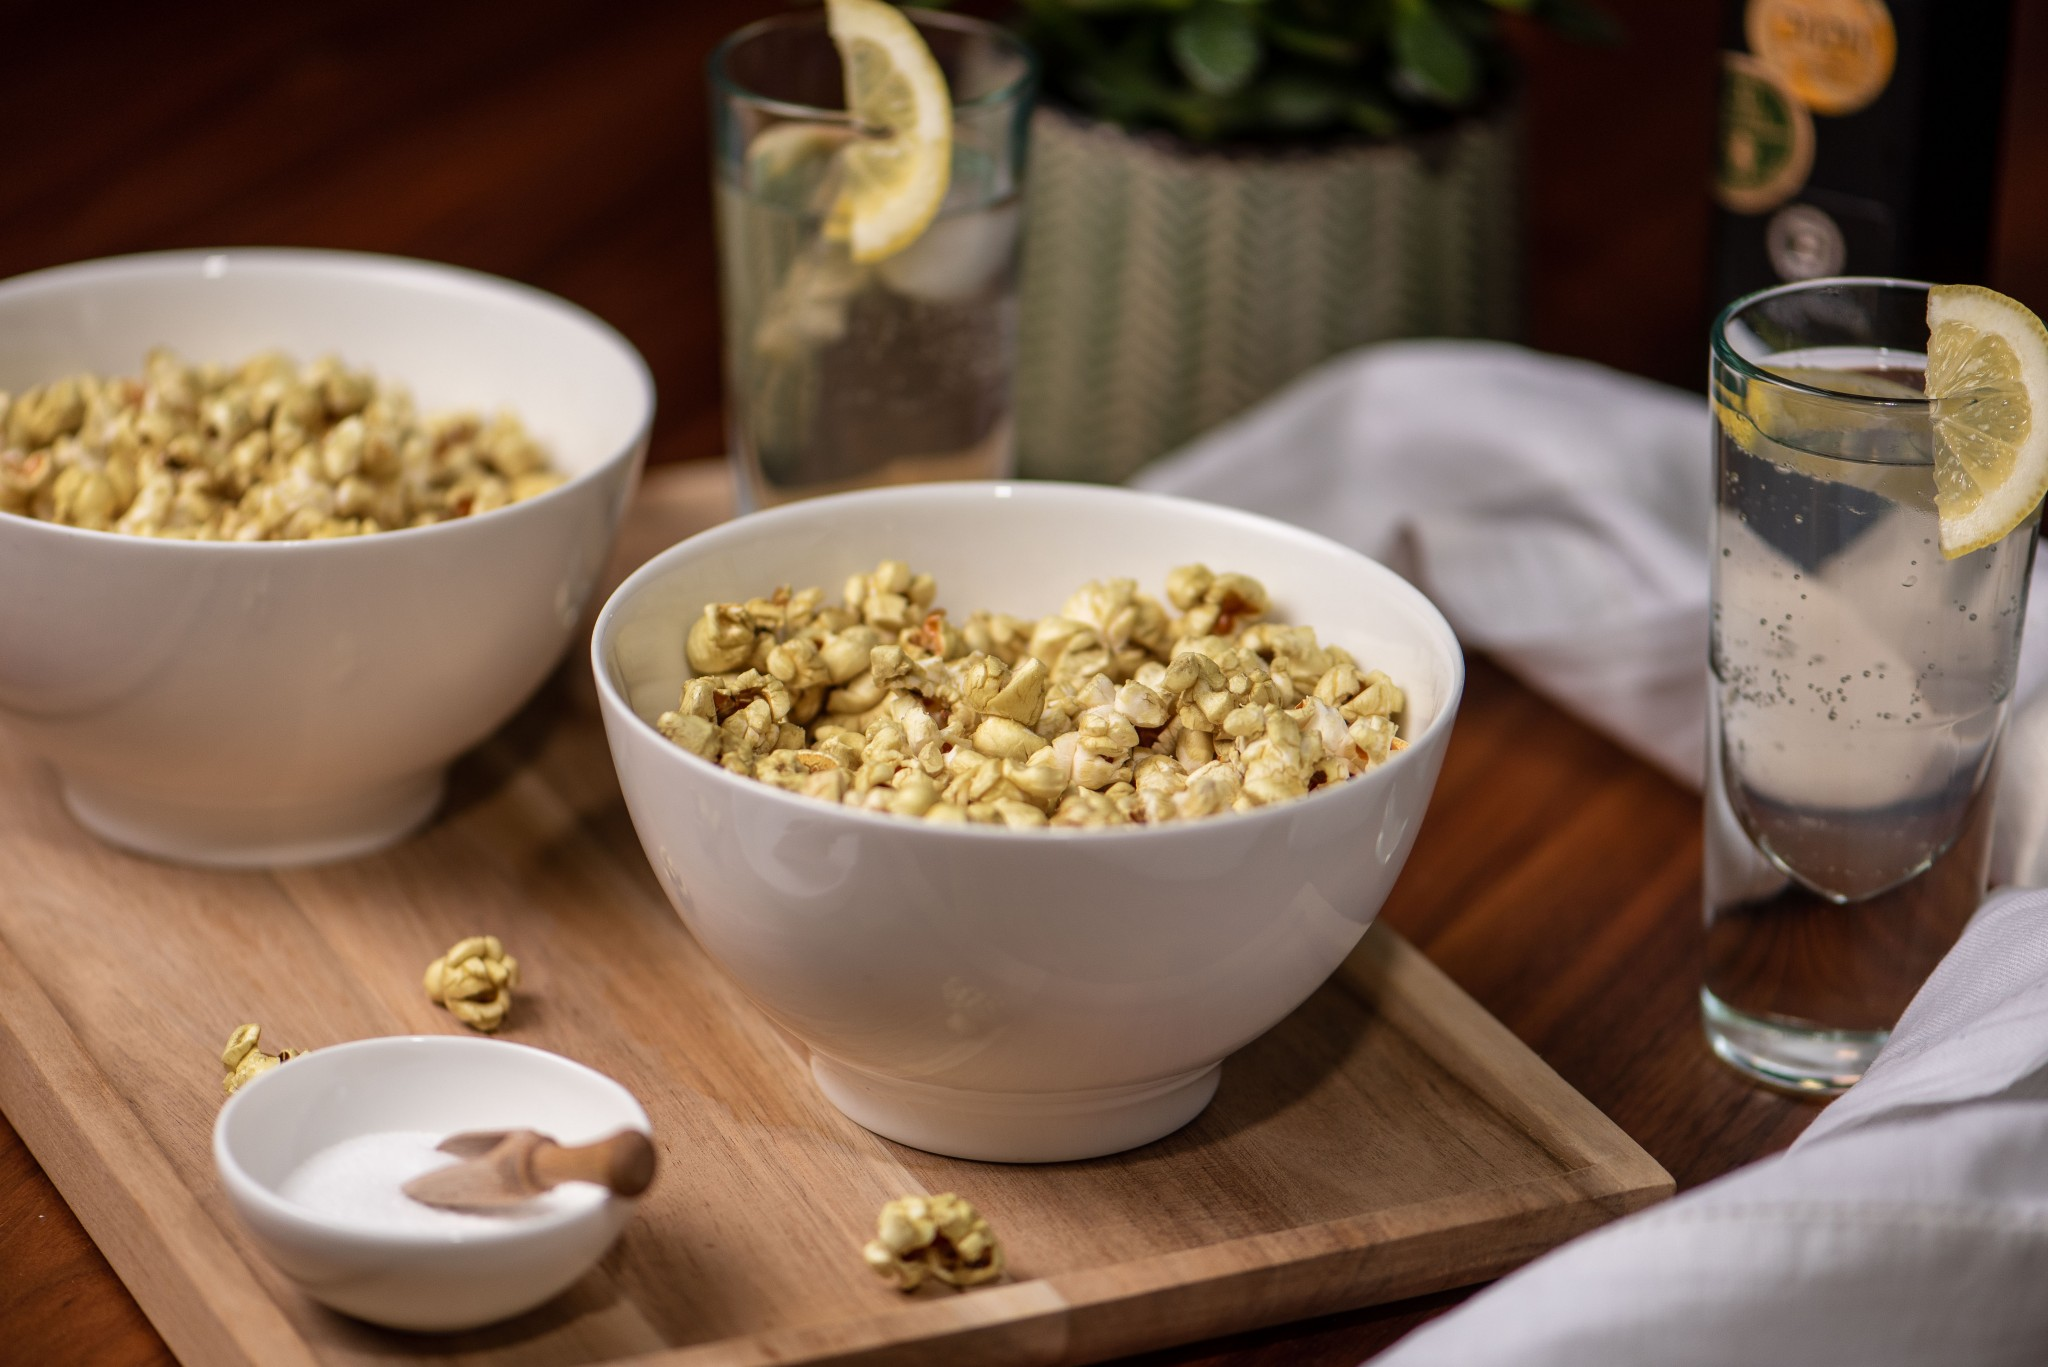 Grünes Popcorn